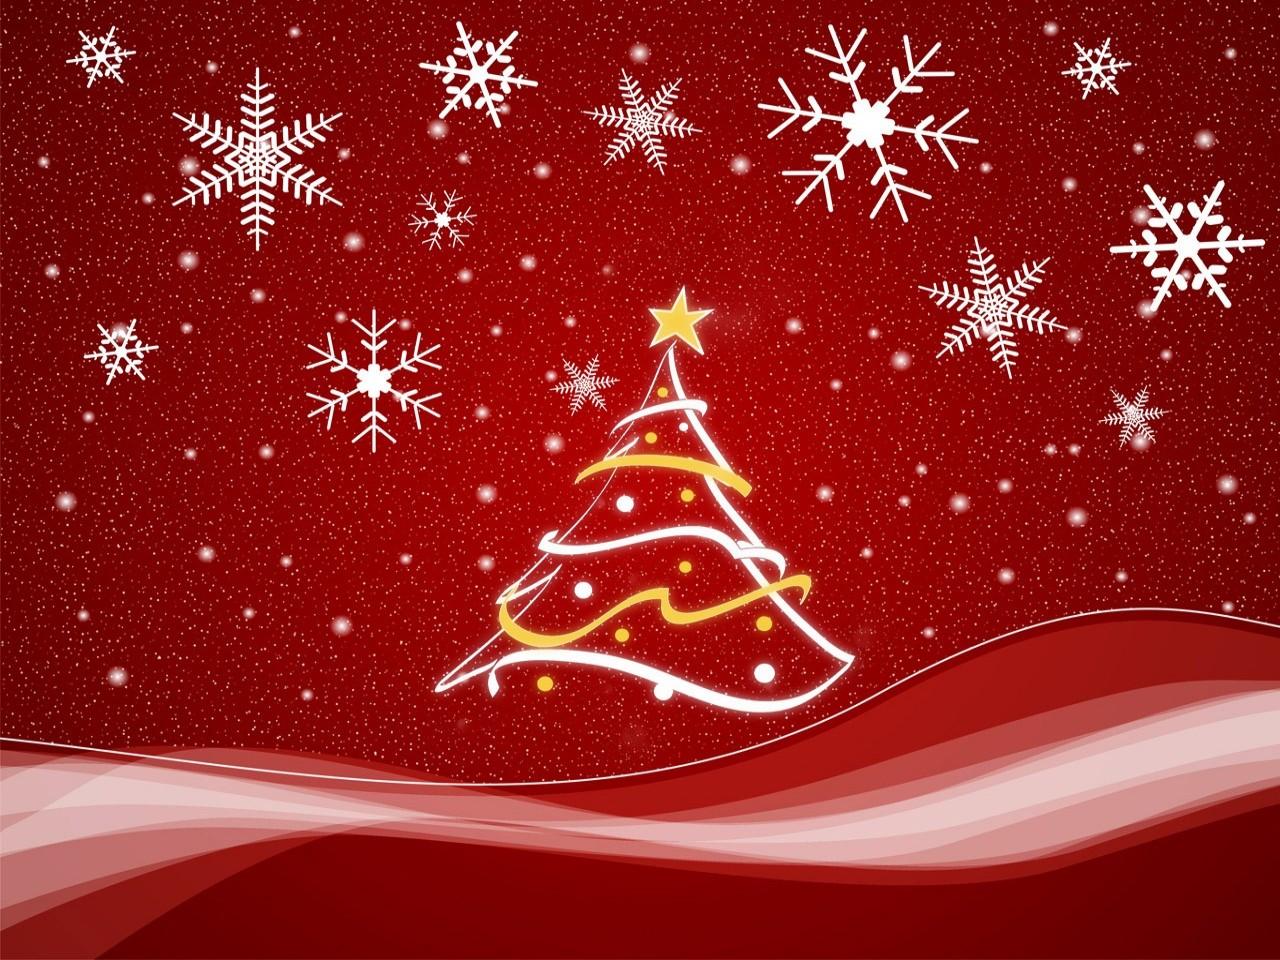 http://3.bp.blogspot.com/-5ZkZPPVIyLc/UL2mrnm3Z0I/AAAAAAAADXs/7v4MClfDmCY/s1600/supereles-baratos-navidad-ano-nuevo-nochevieja-nochebuena-alojamiento-y-reserva.jpg